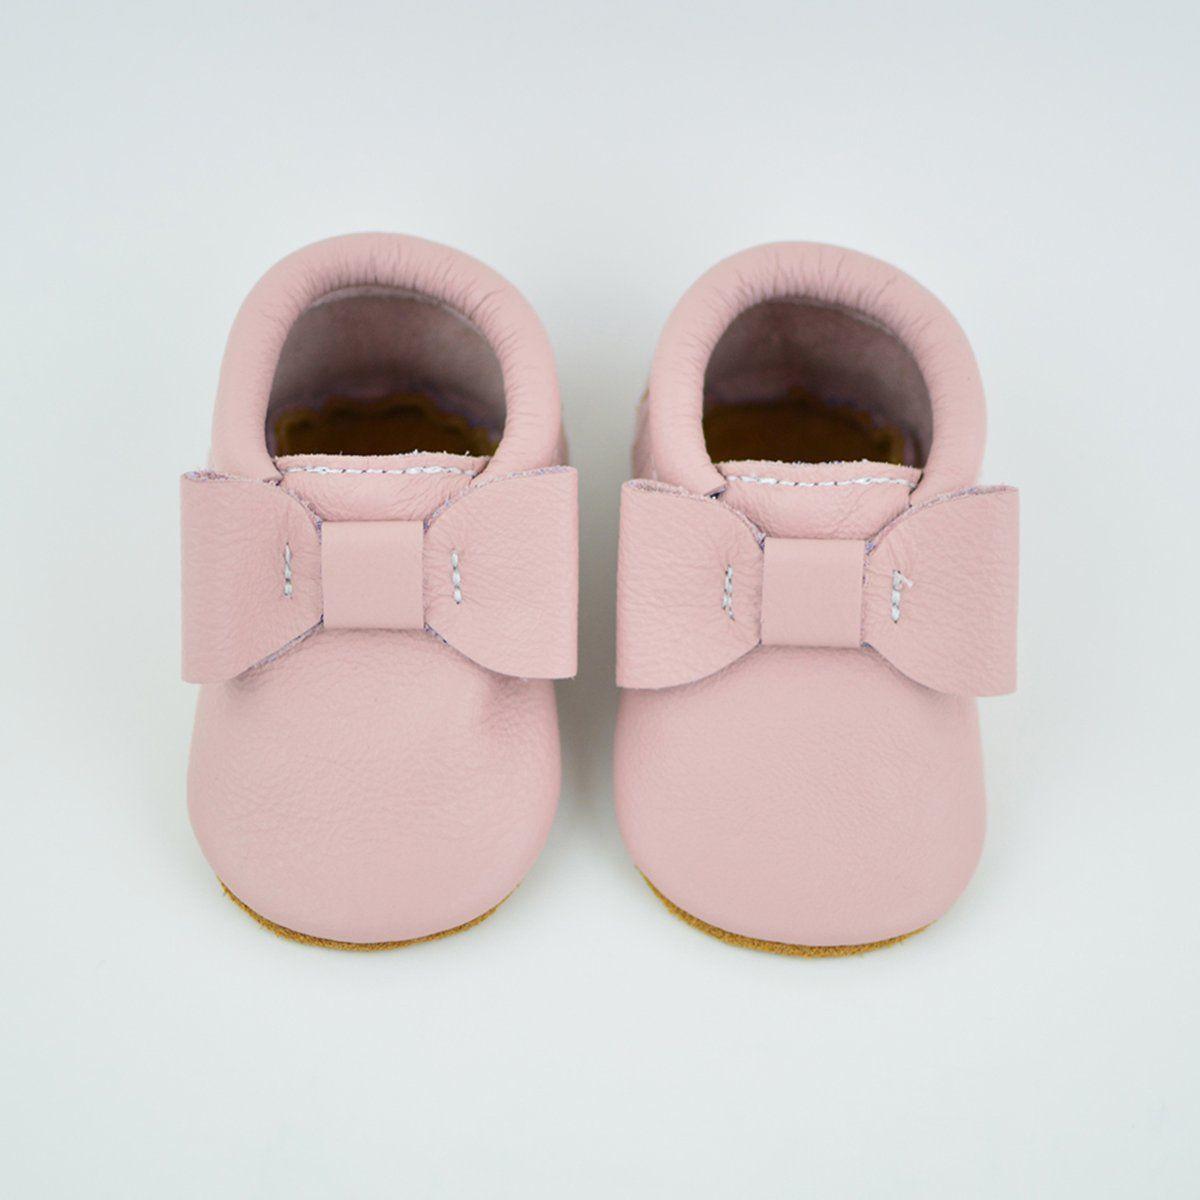 95c409f6dedaa New) Blush Pink Bow Moccs | A few of Maddie favorite things | Blush ...